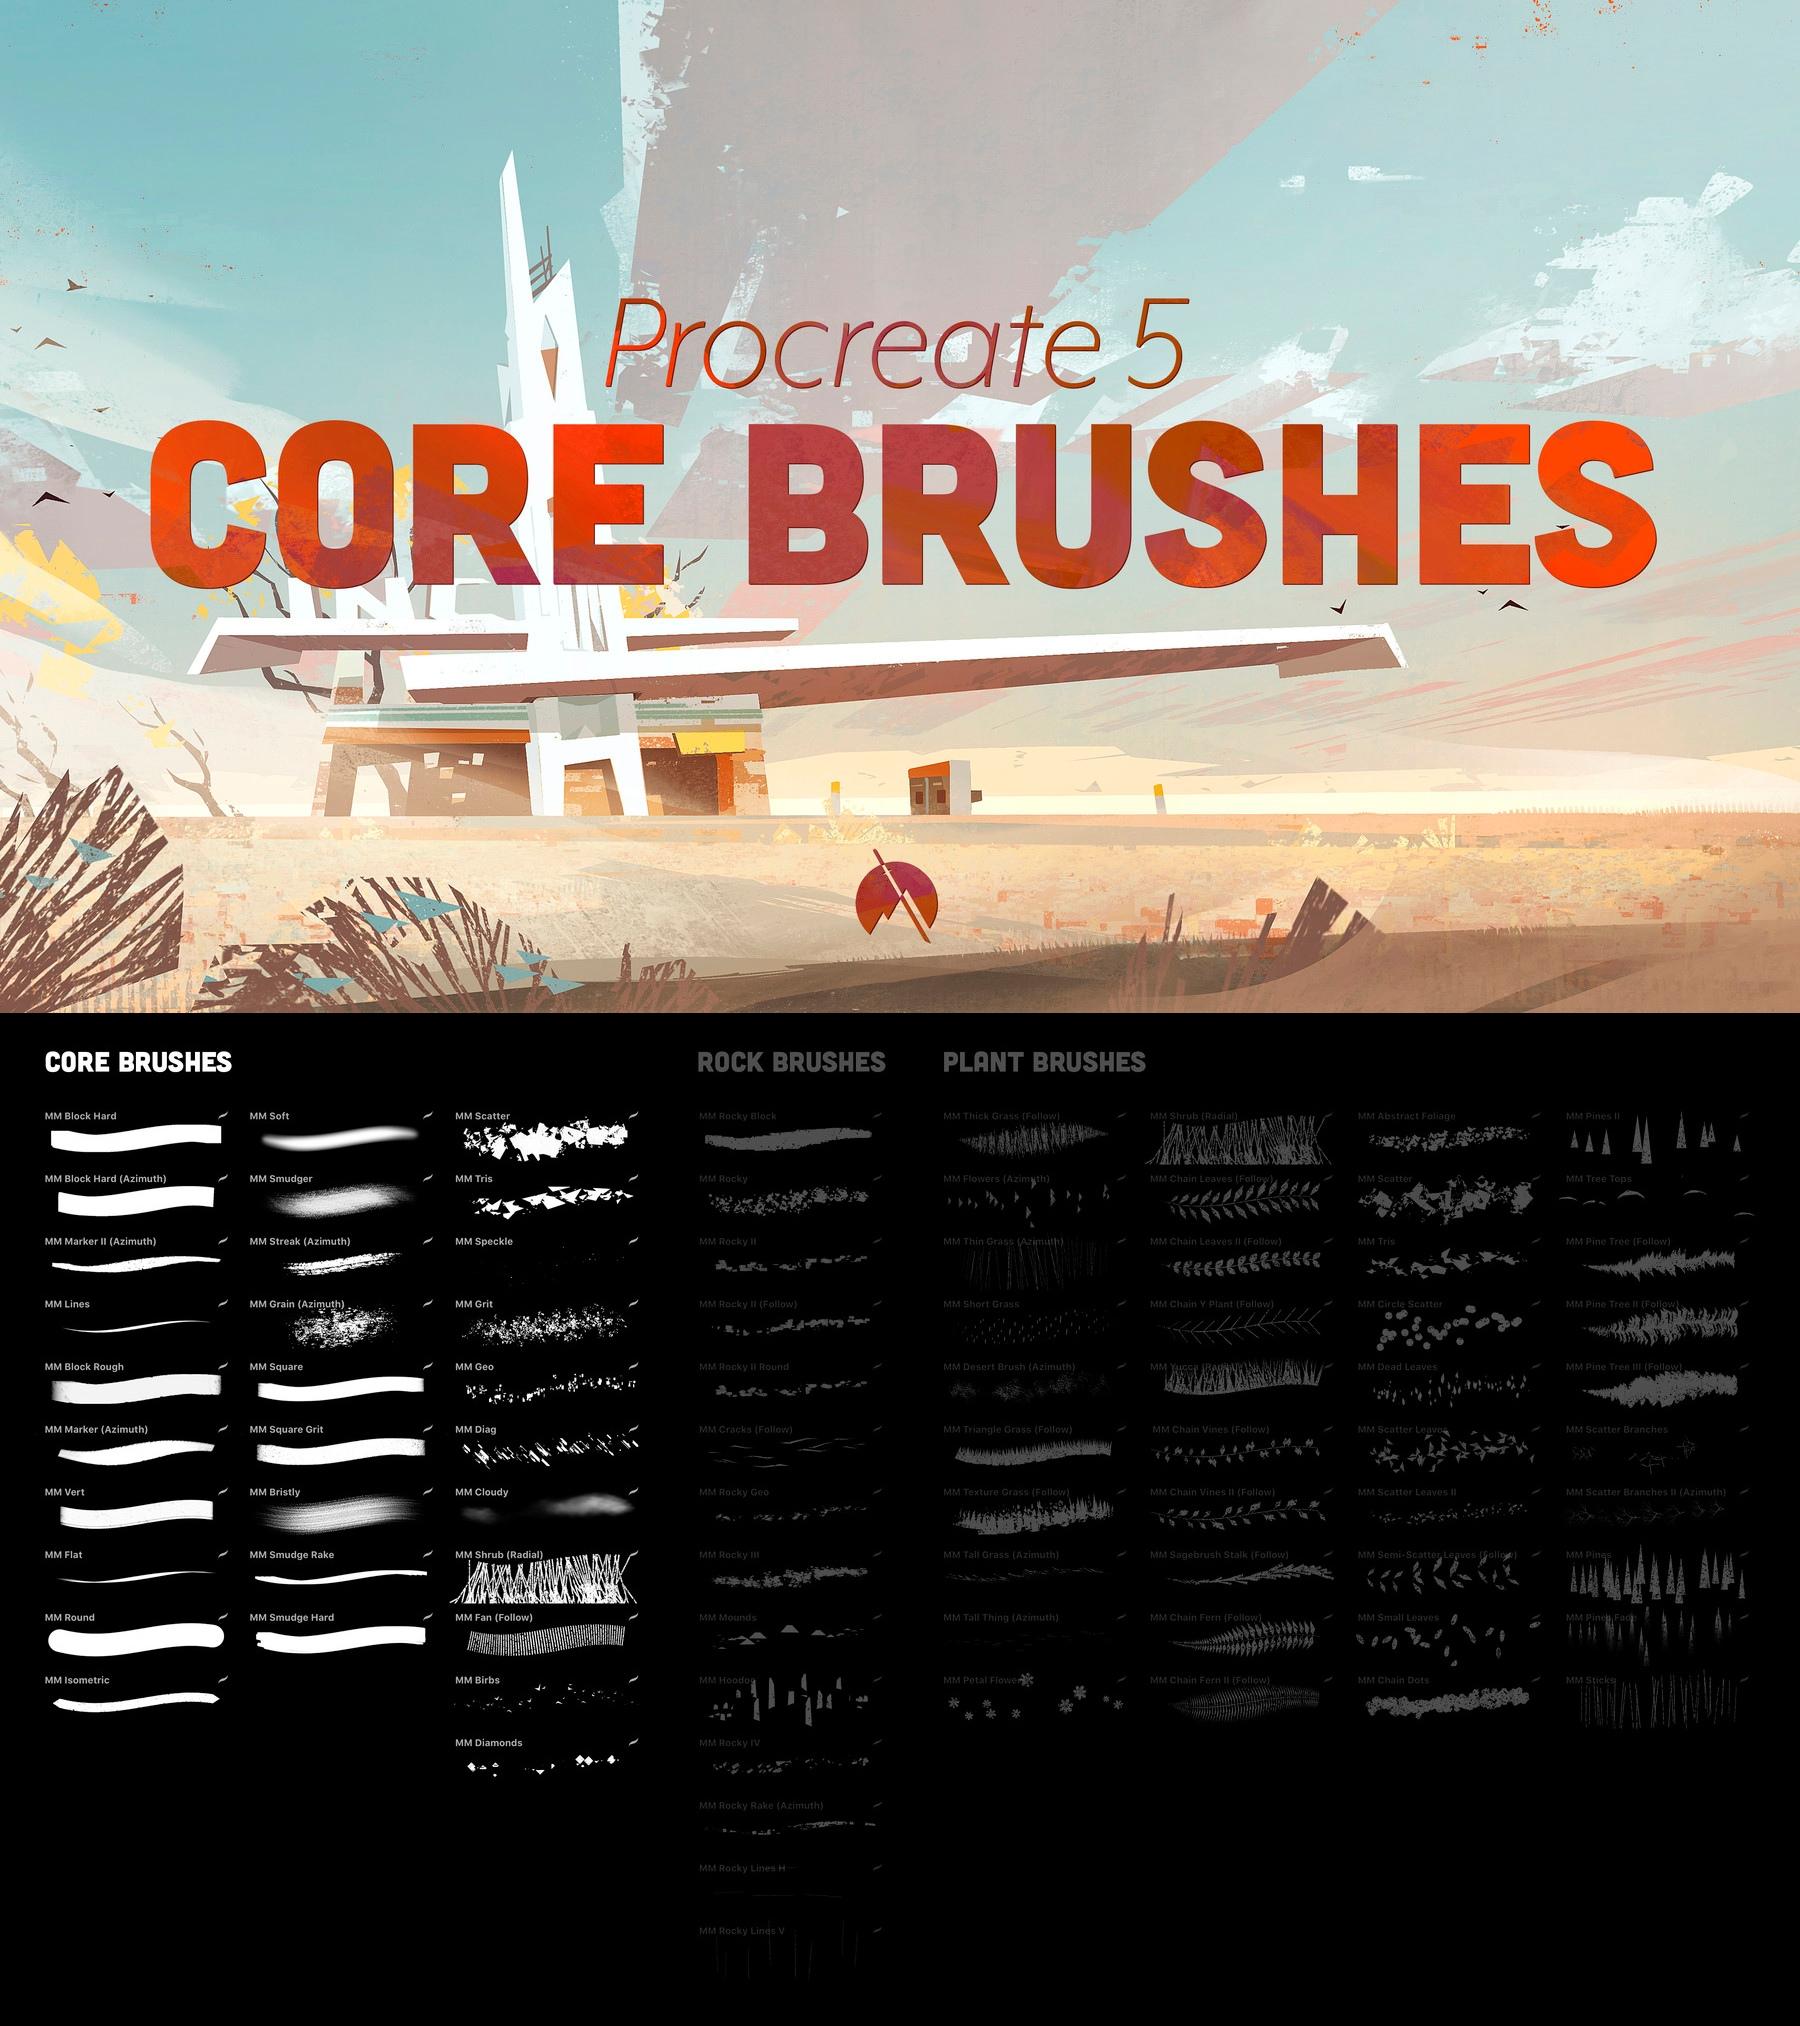 29个树叶小草不规则绘画画笔Procreate笔刷 CORE Brushes – 29 Custom Brushes For Procreate 5插图